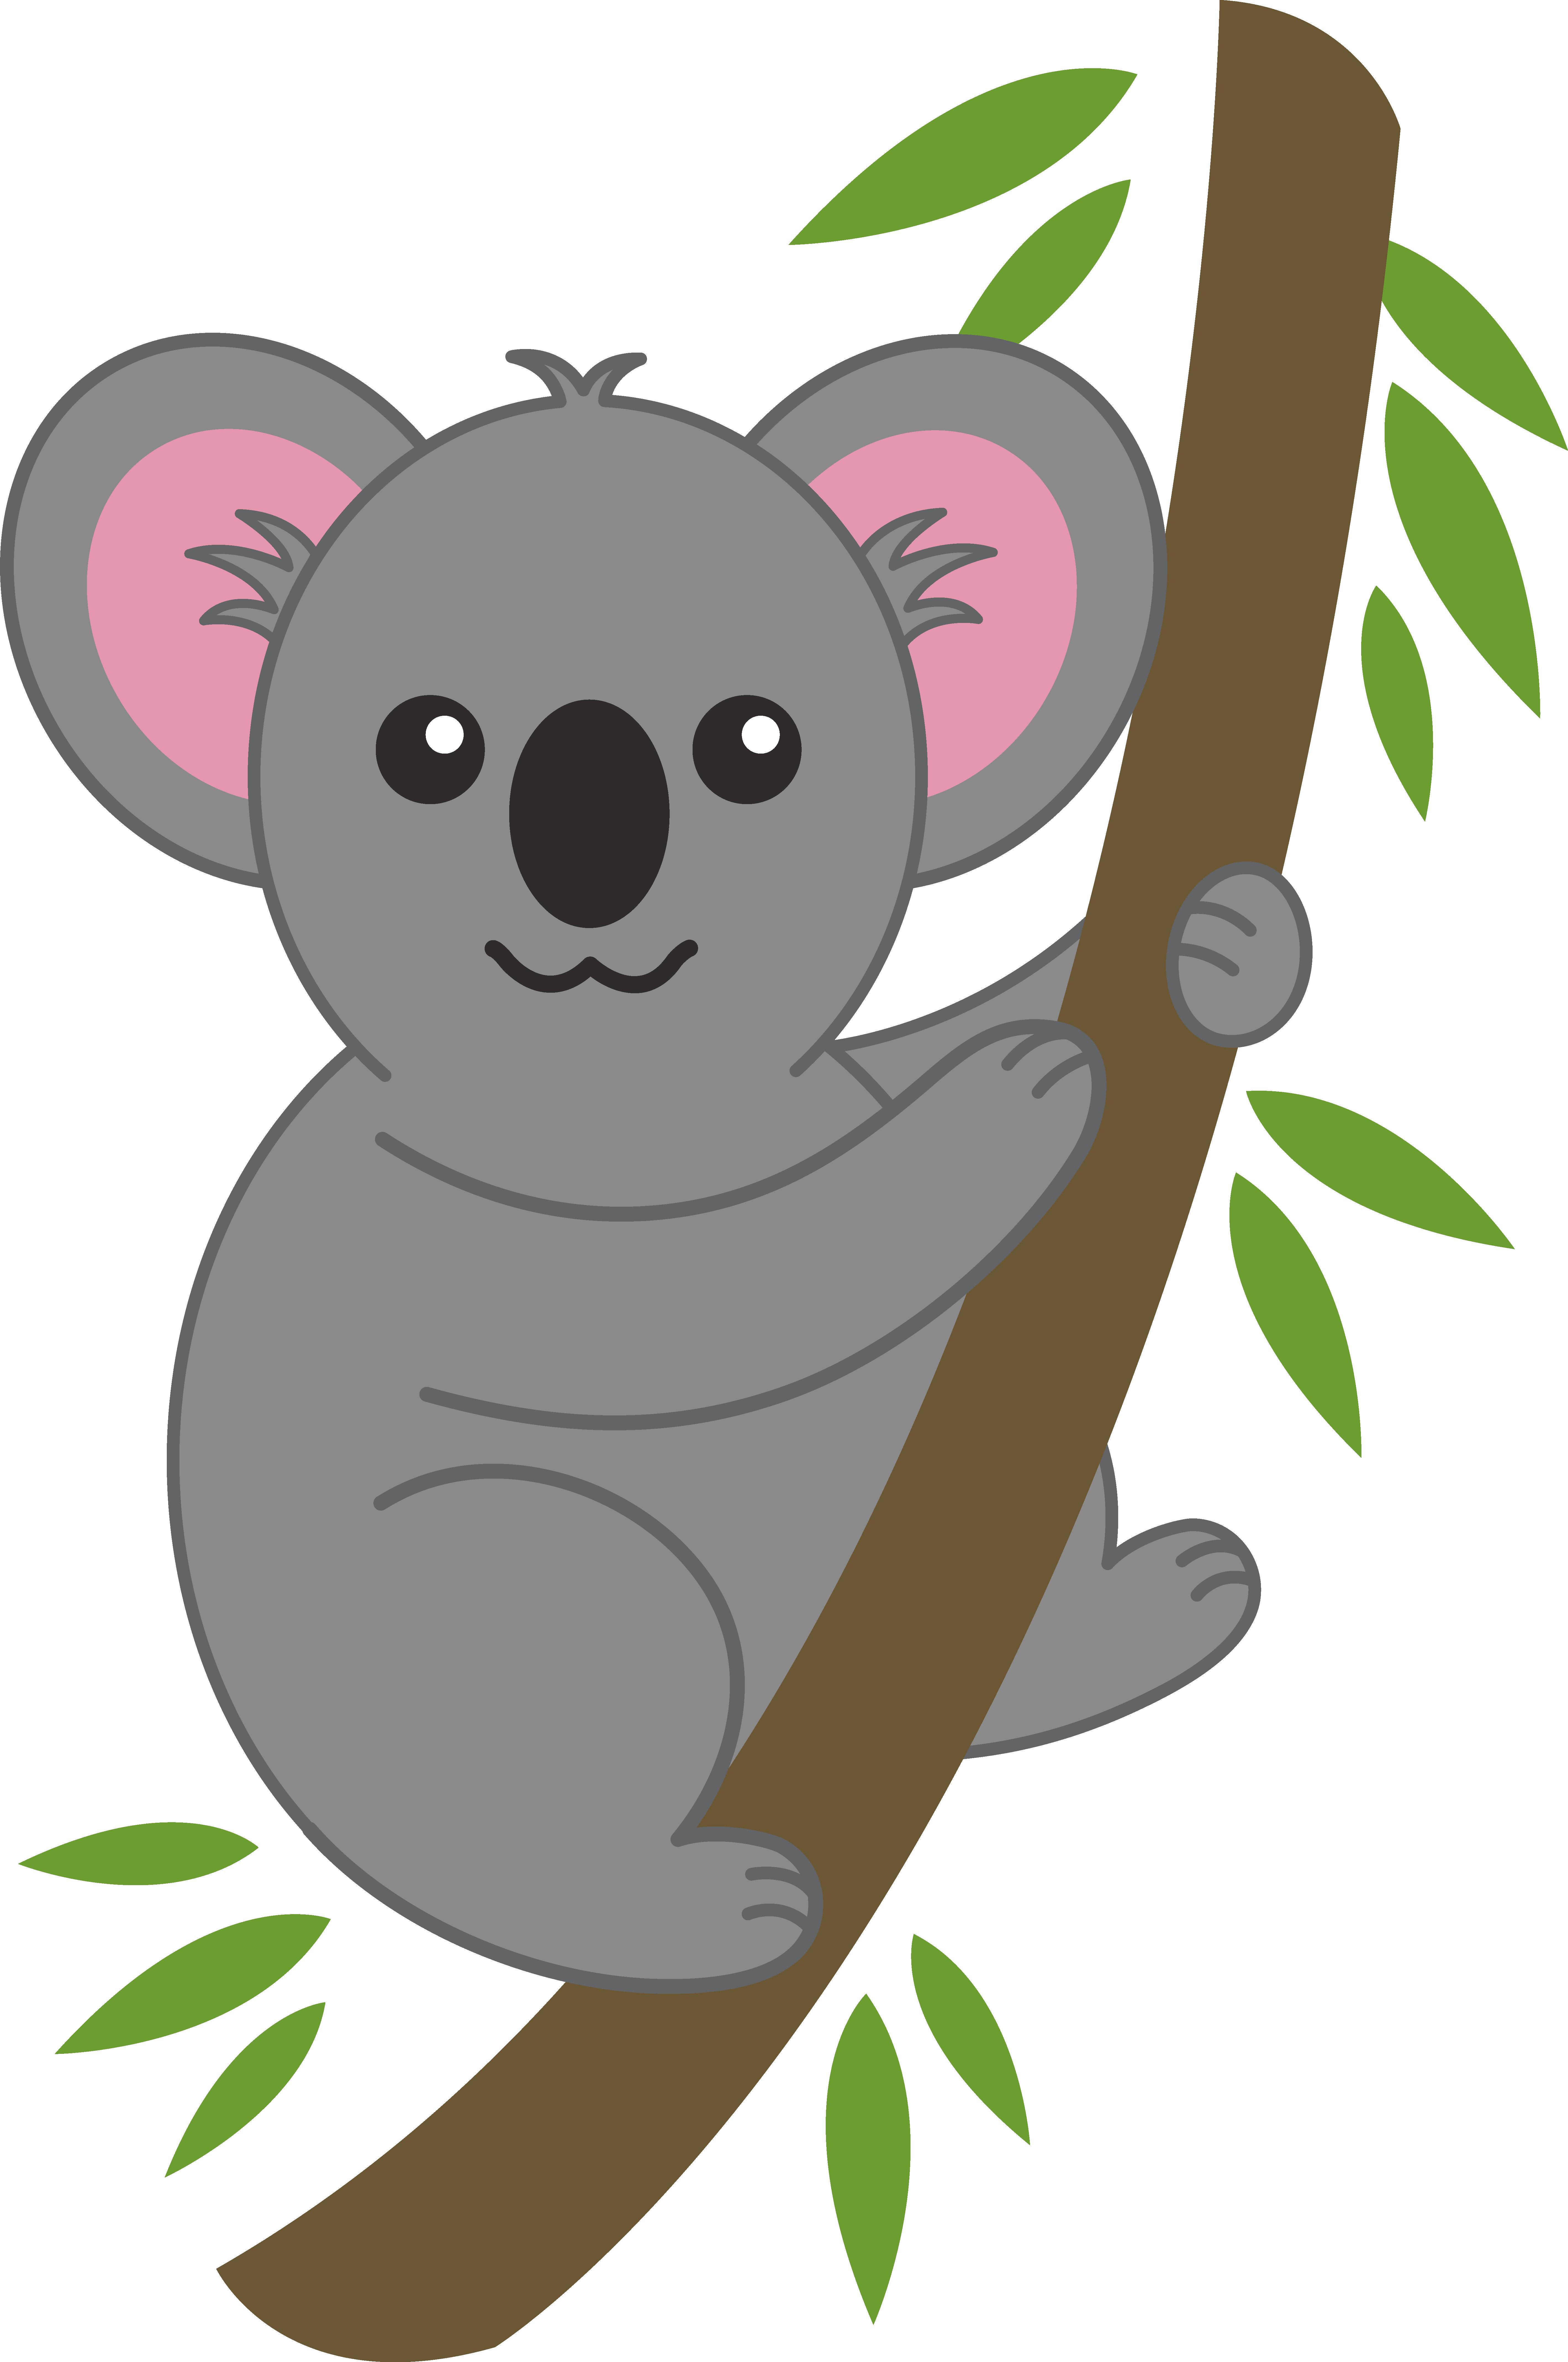 koala bear clip art cute koala on tree branch free clip art rh pinterest com Koala Bear Cartoon Koala Bear Template